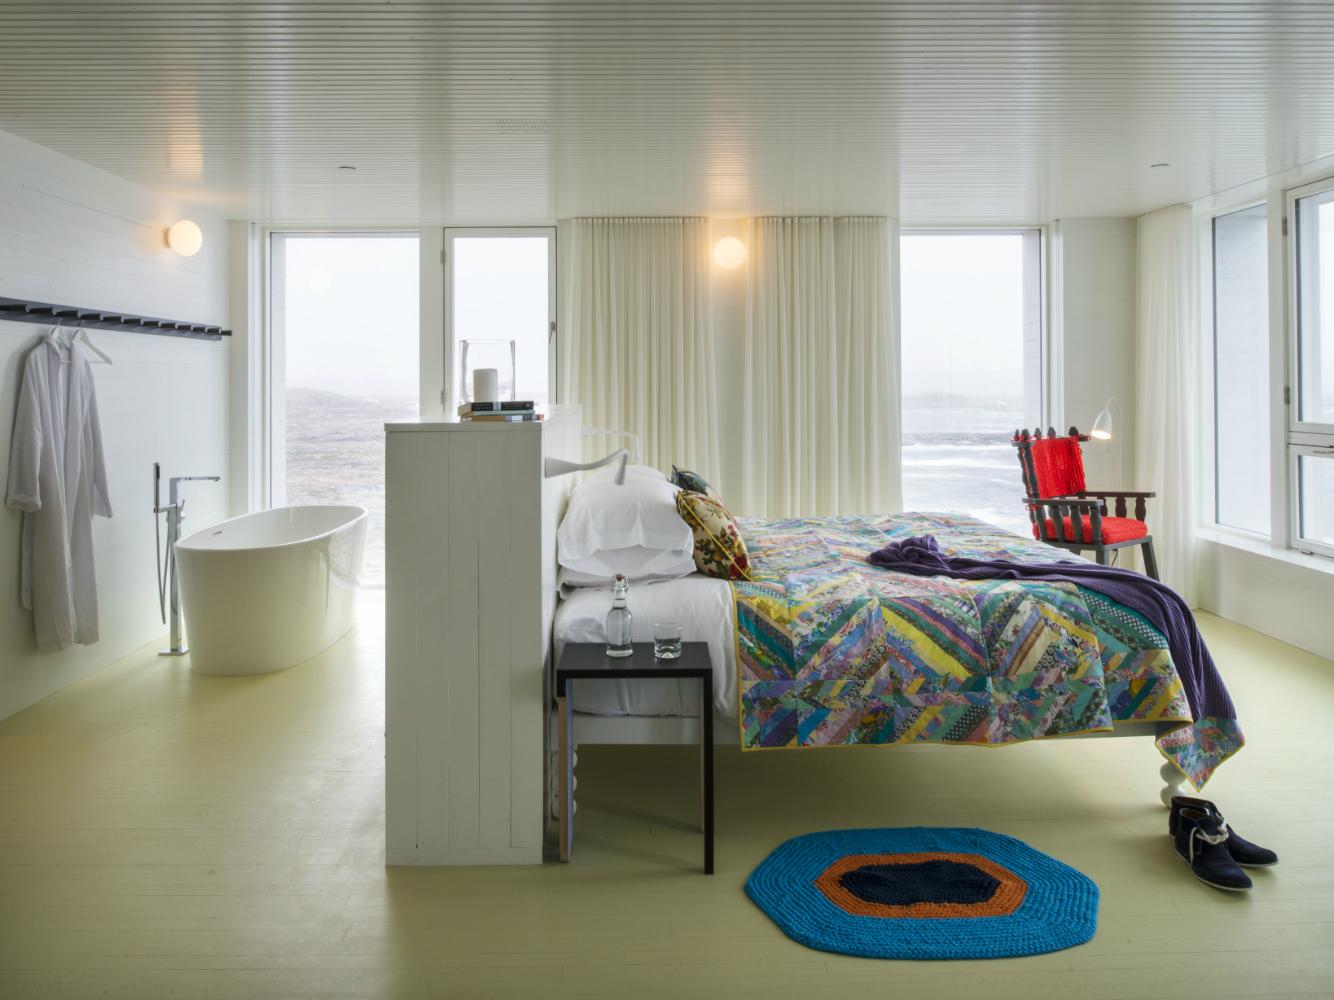 C-4_FogoIsland_Rooms_4628_original_Alex_Fradkin_original-w1500-h1000